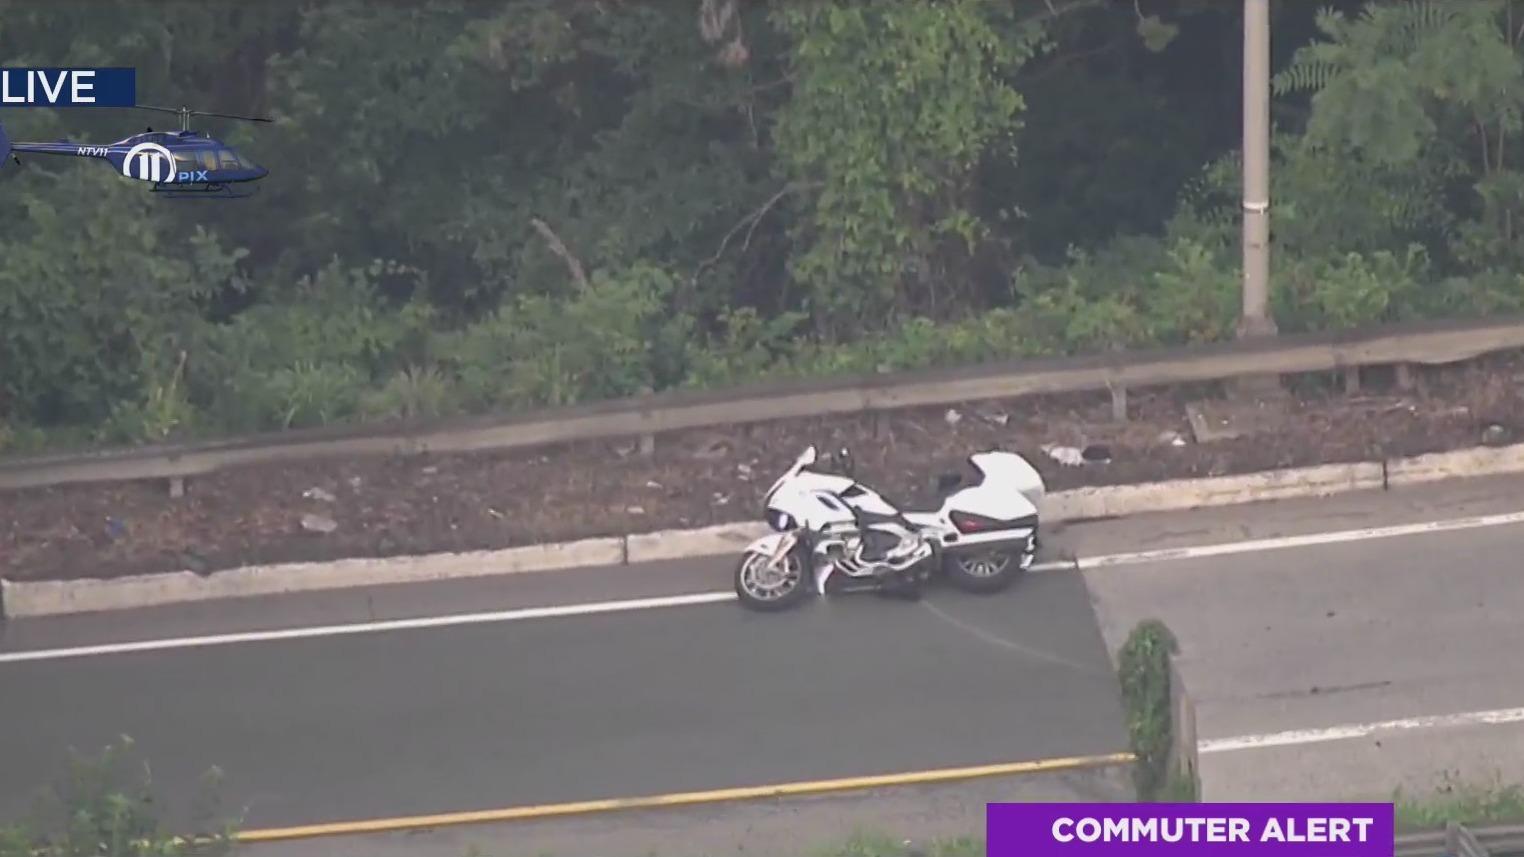 New Jersey motorcycle crash on I-287